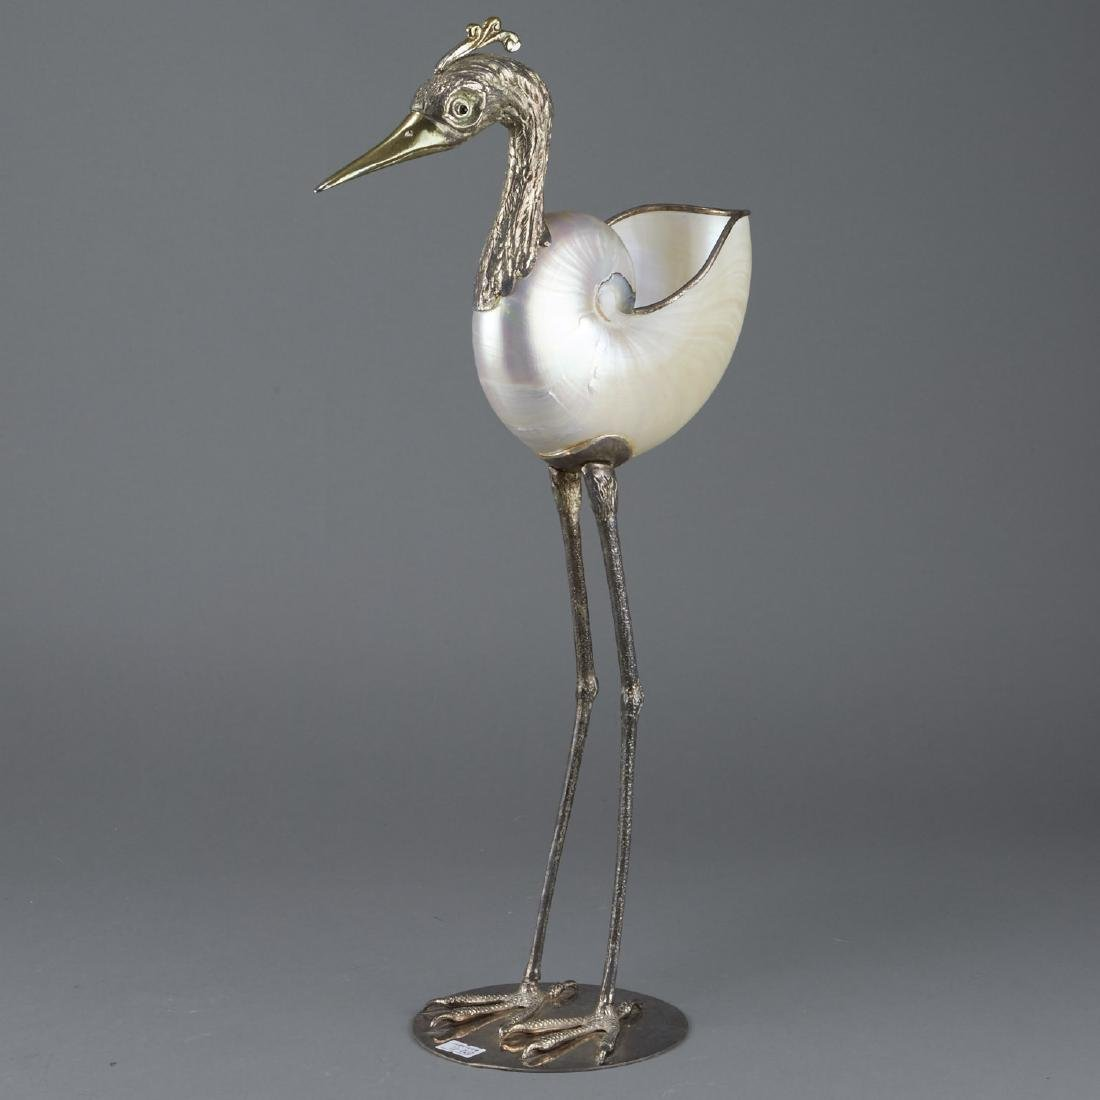 Binazzi Italian Silver and Nautilus Shell Egret